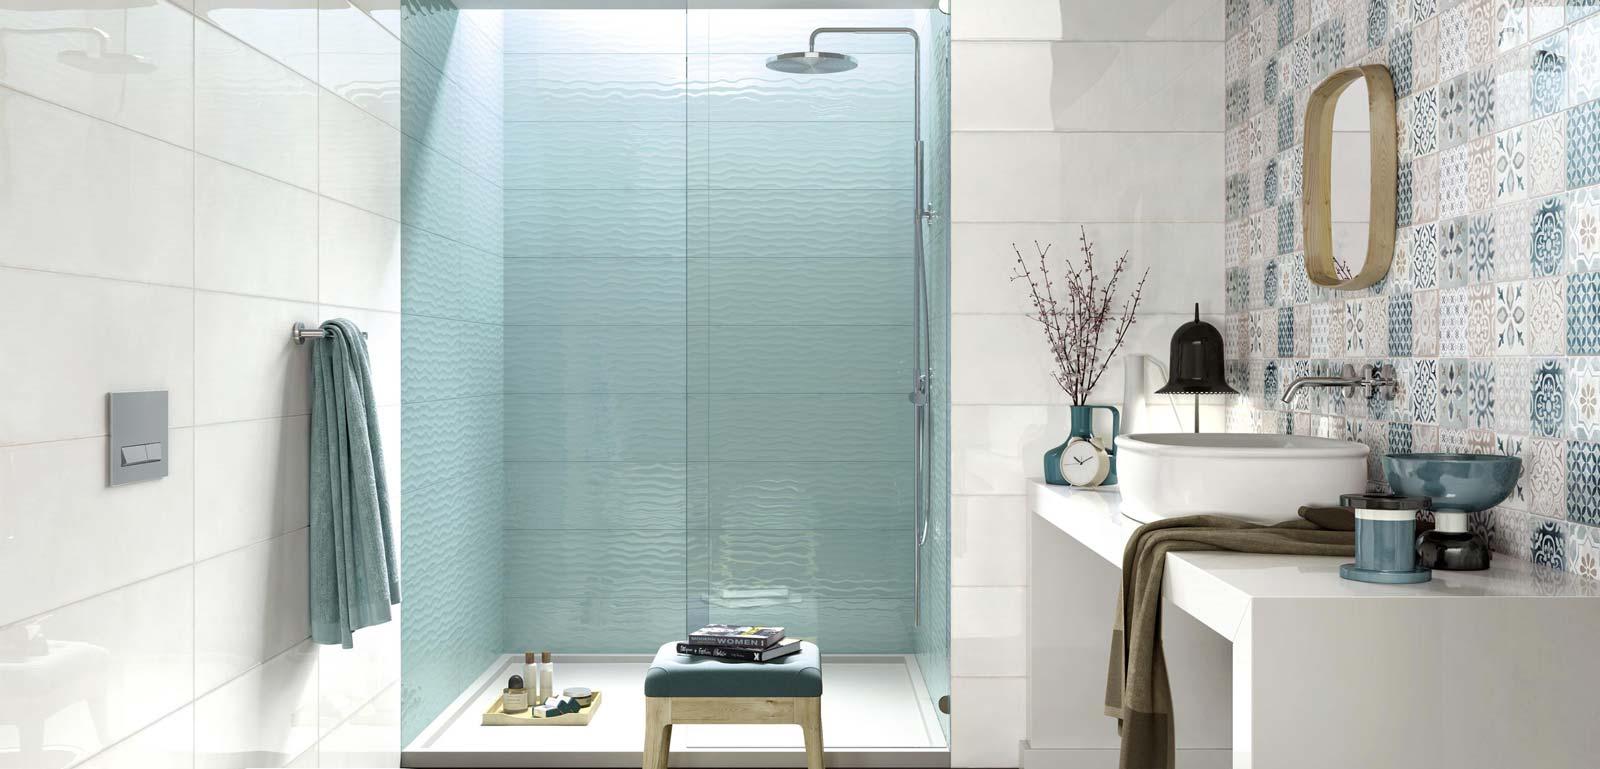 Rivestimento bagno moderno frame energy ragno for Bagni ragno